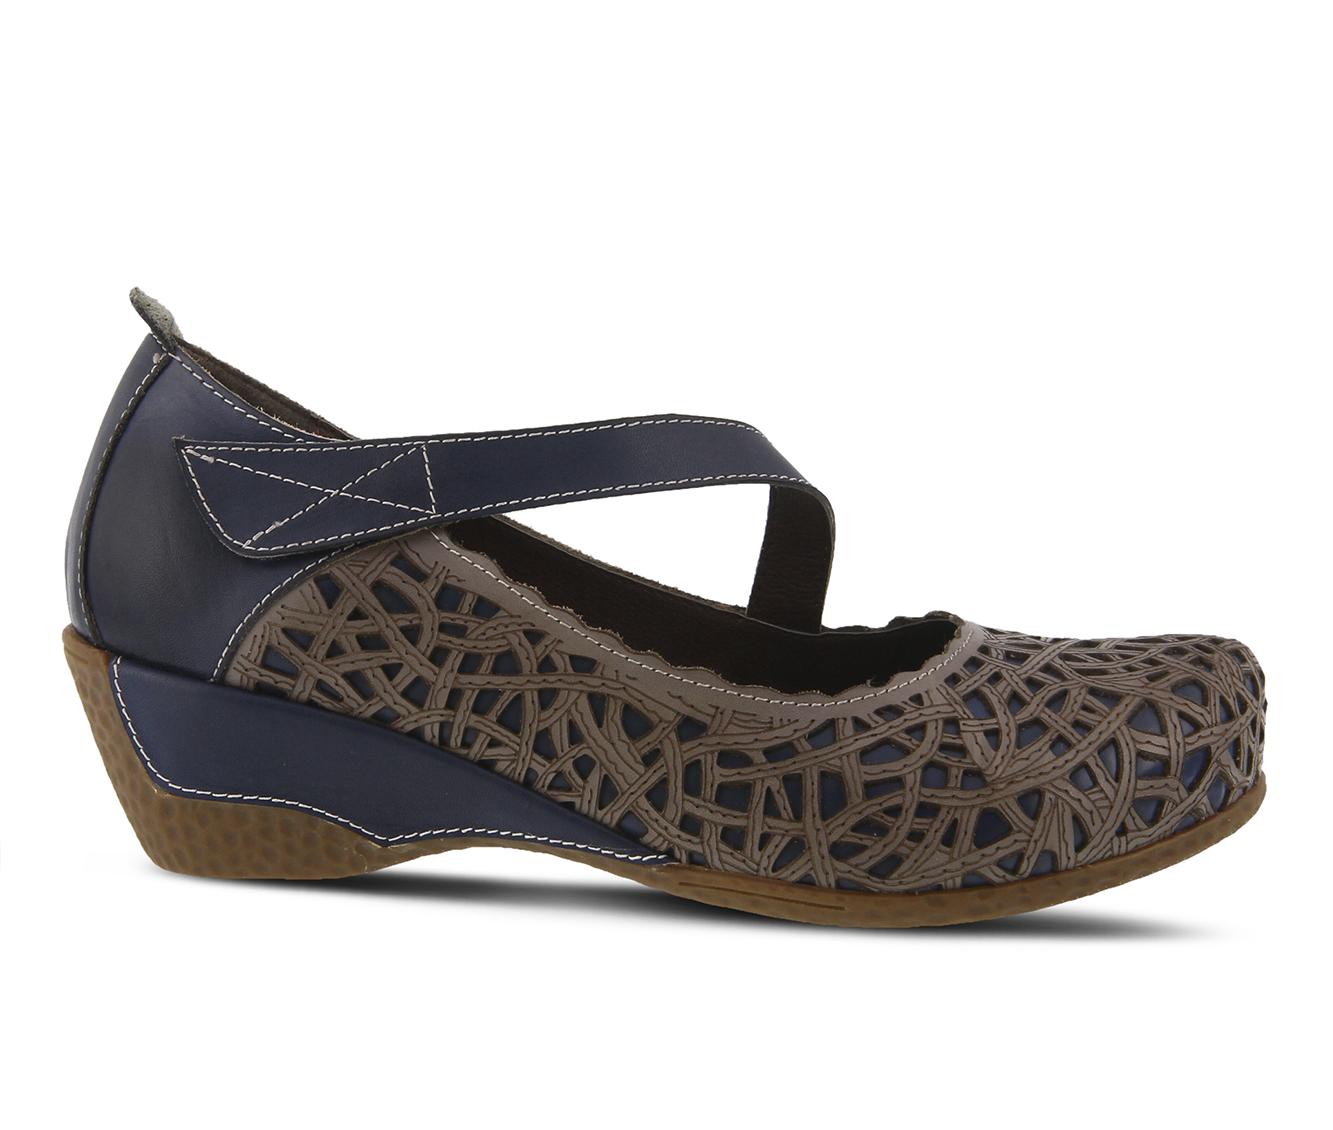 L'Artiste Melinda Women's Shoe (Blue Leather)